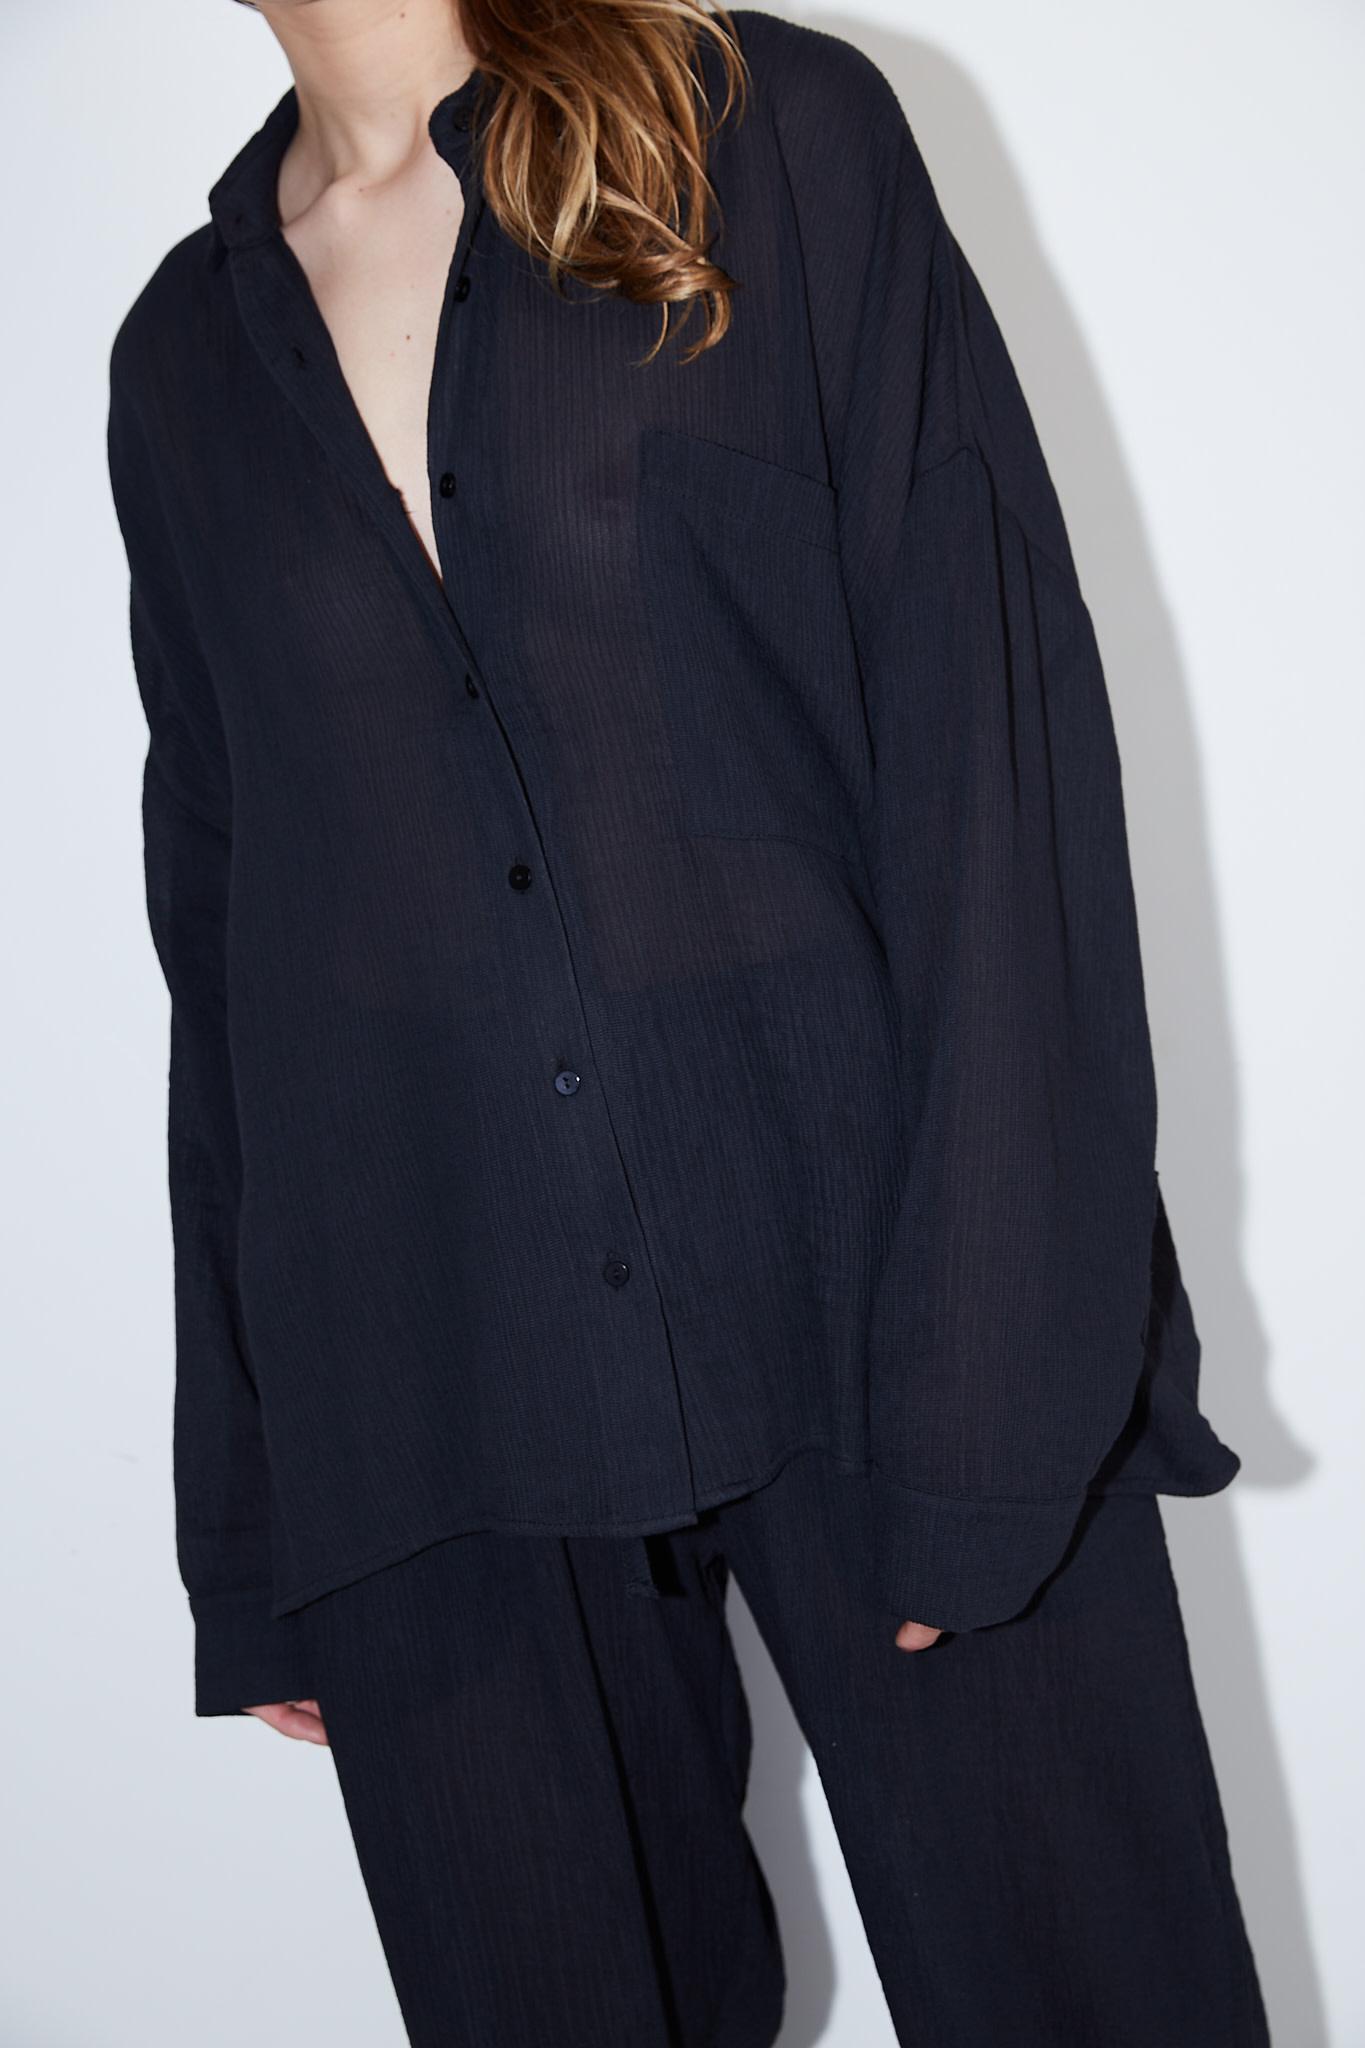 Can Pep Rey - Rafael sirio unisex shirt